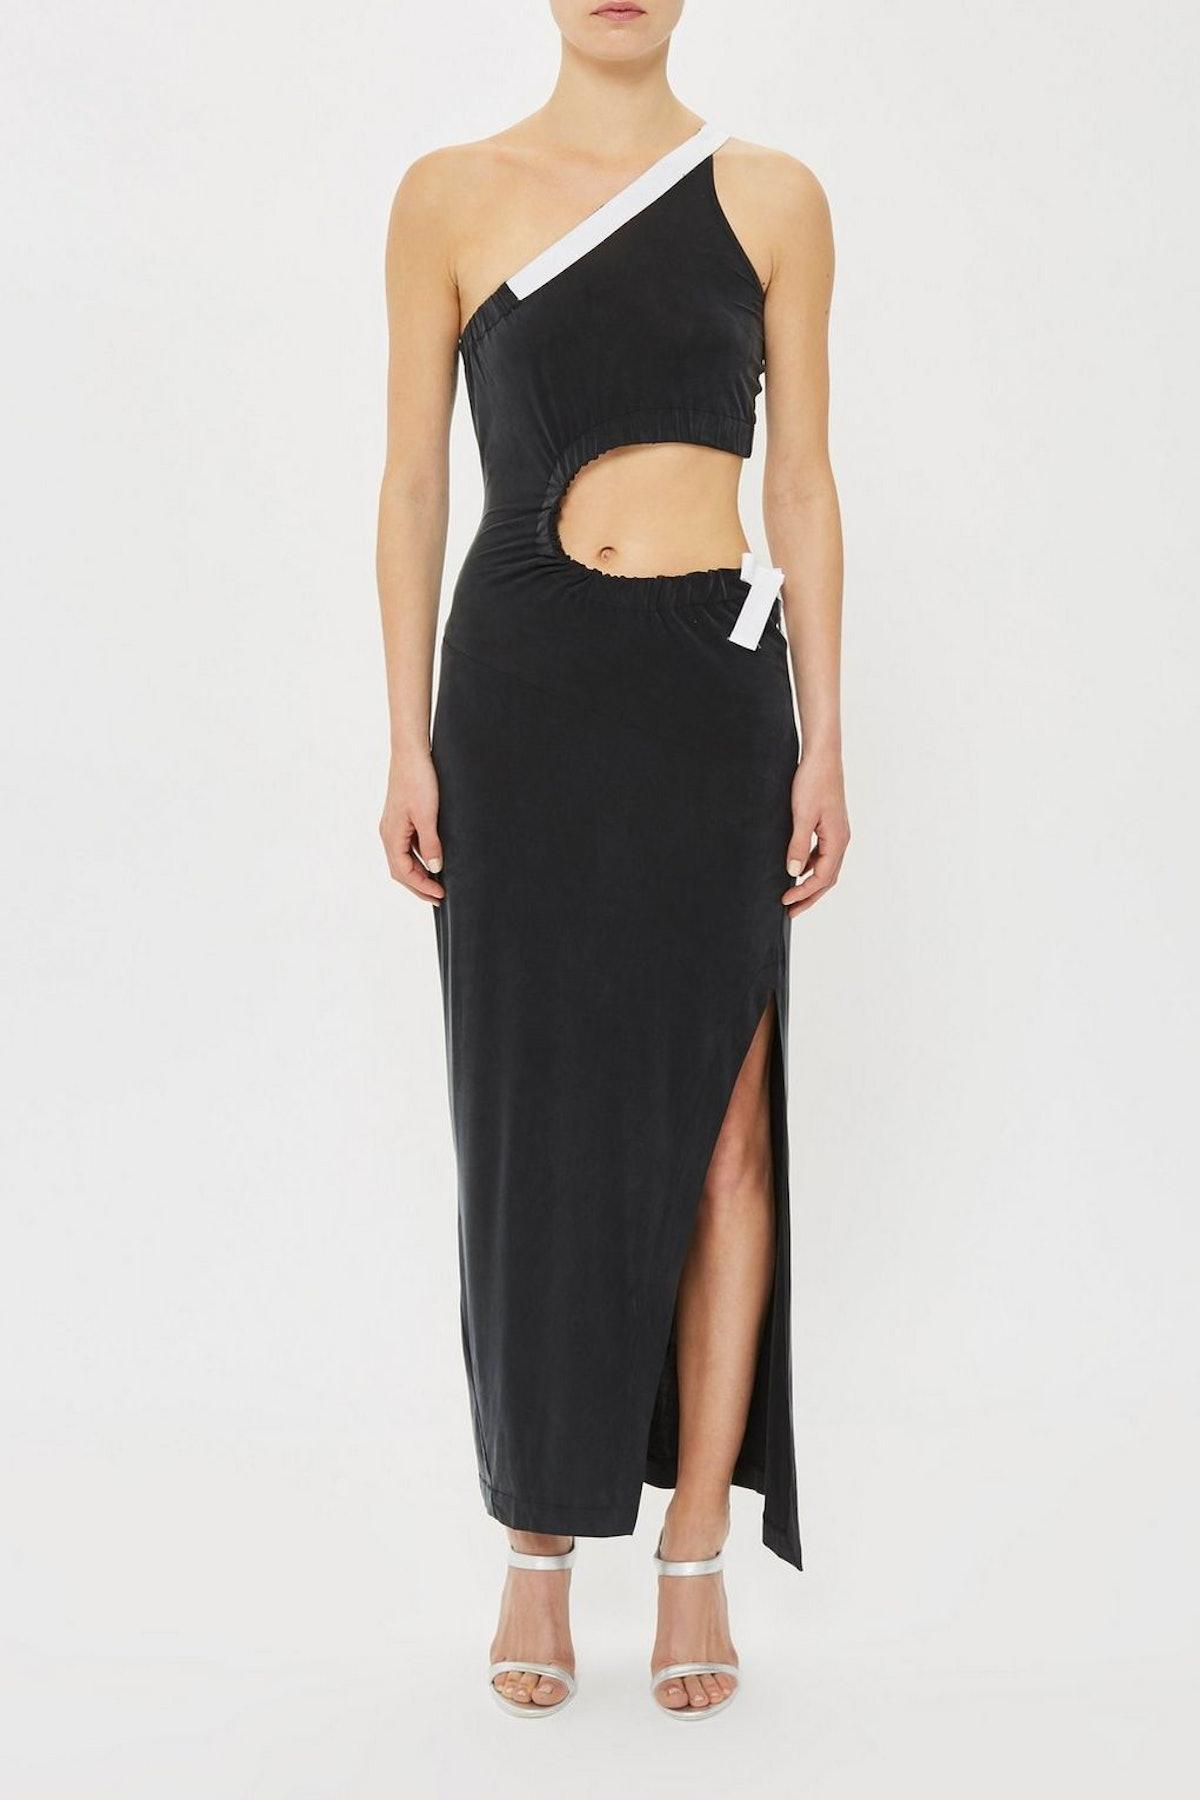 Cremorne Maxi Dress by Boutique